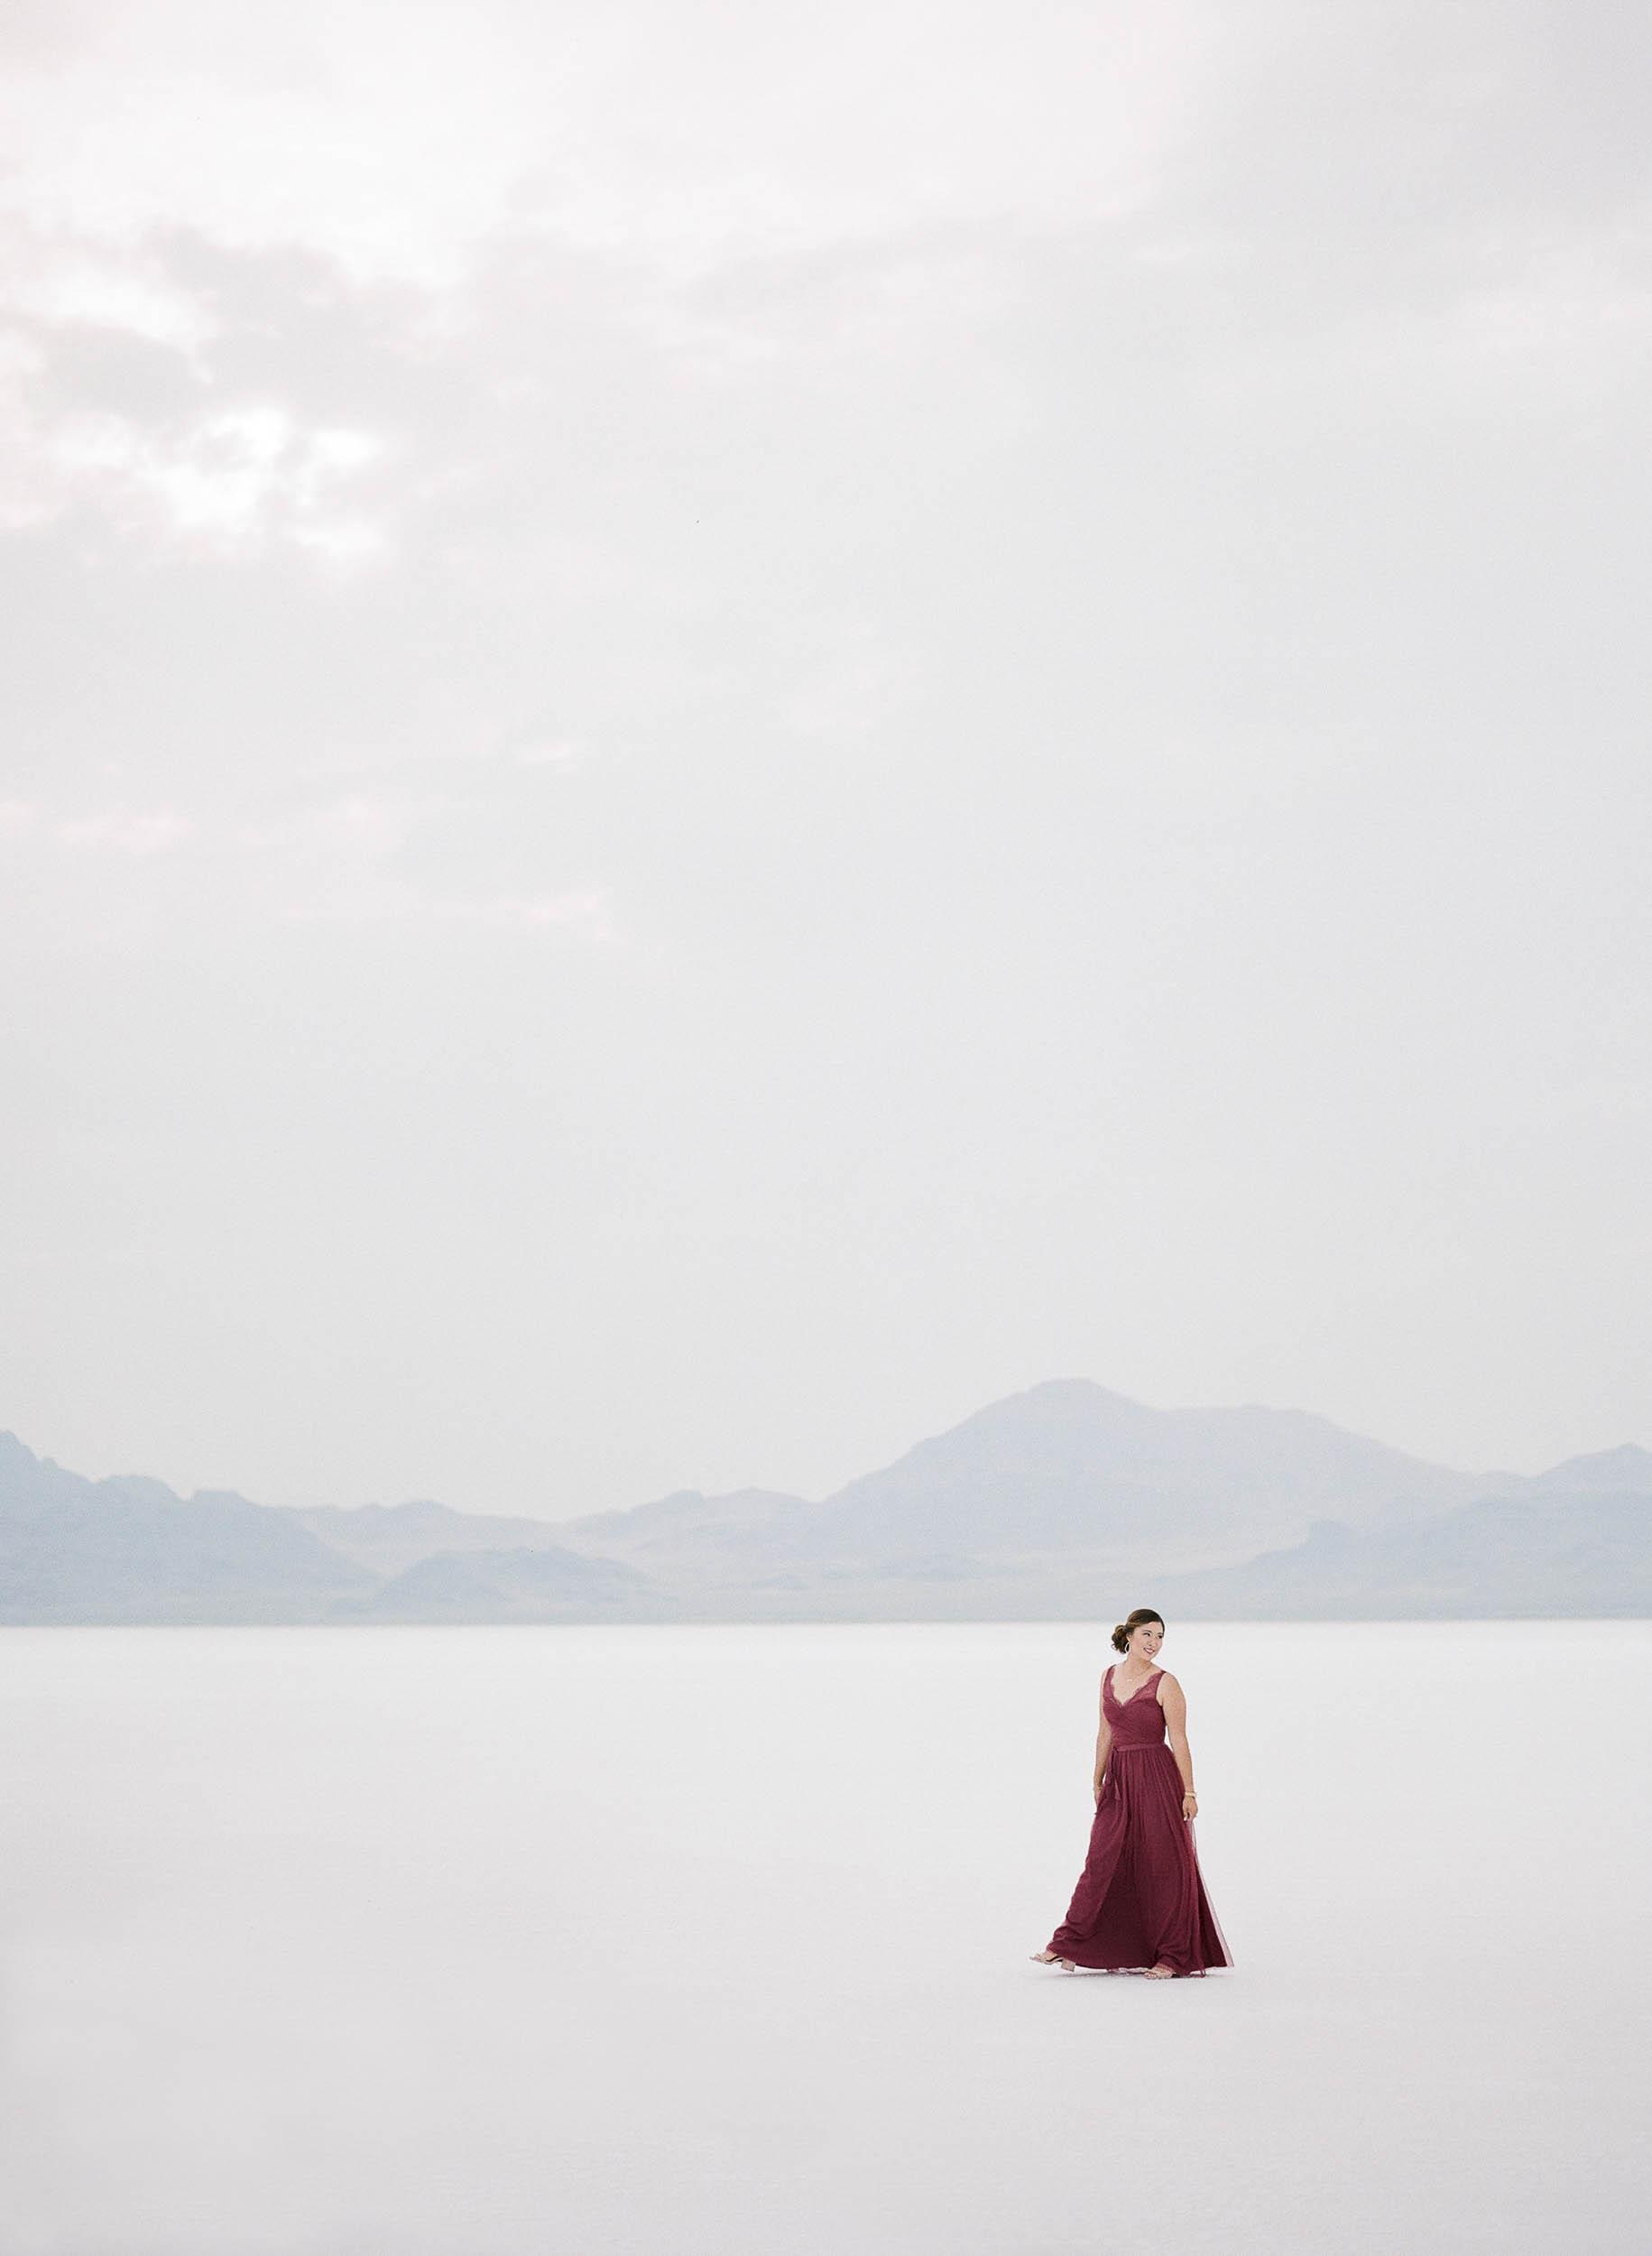 070918_Sandy A La Mode_Family_Utah Salt Flats_Buena Lane Photography_F400_17.jpg